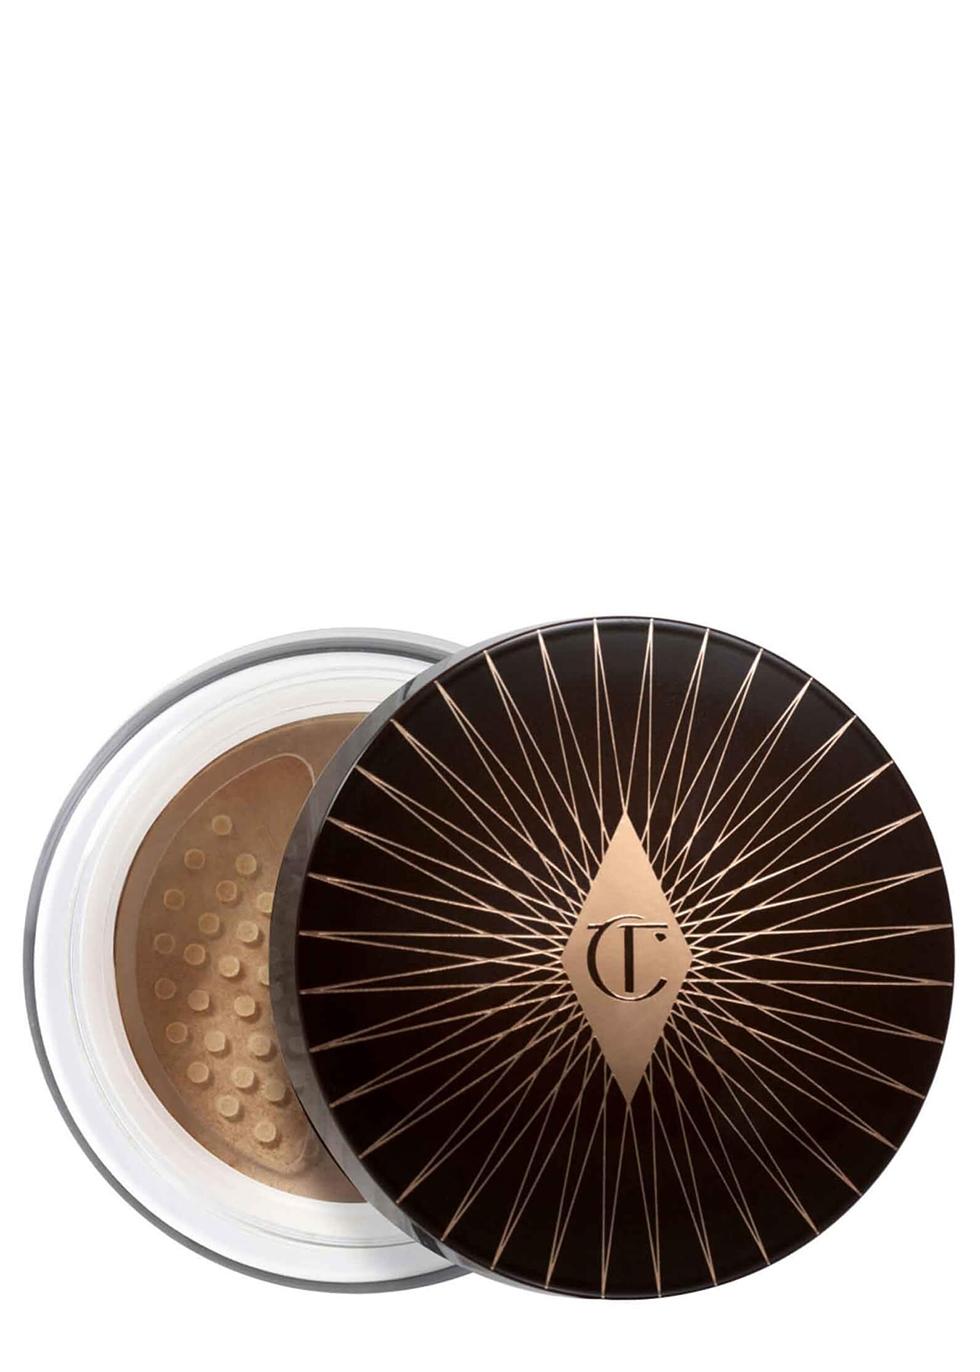 Genius Loose Powder - Charlotte Tilbury